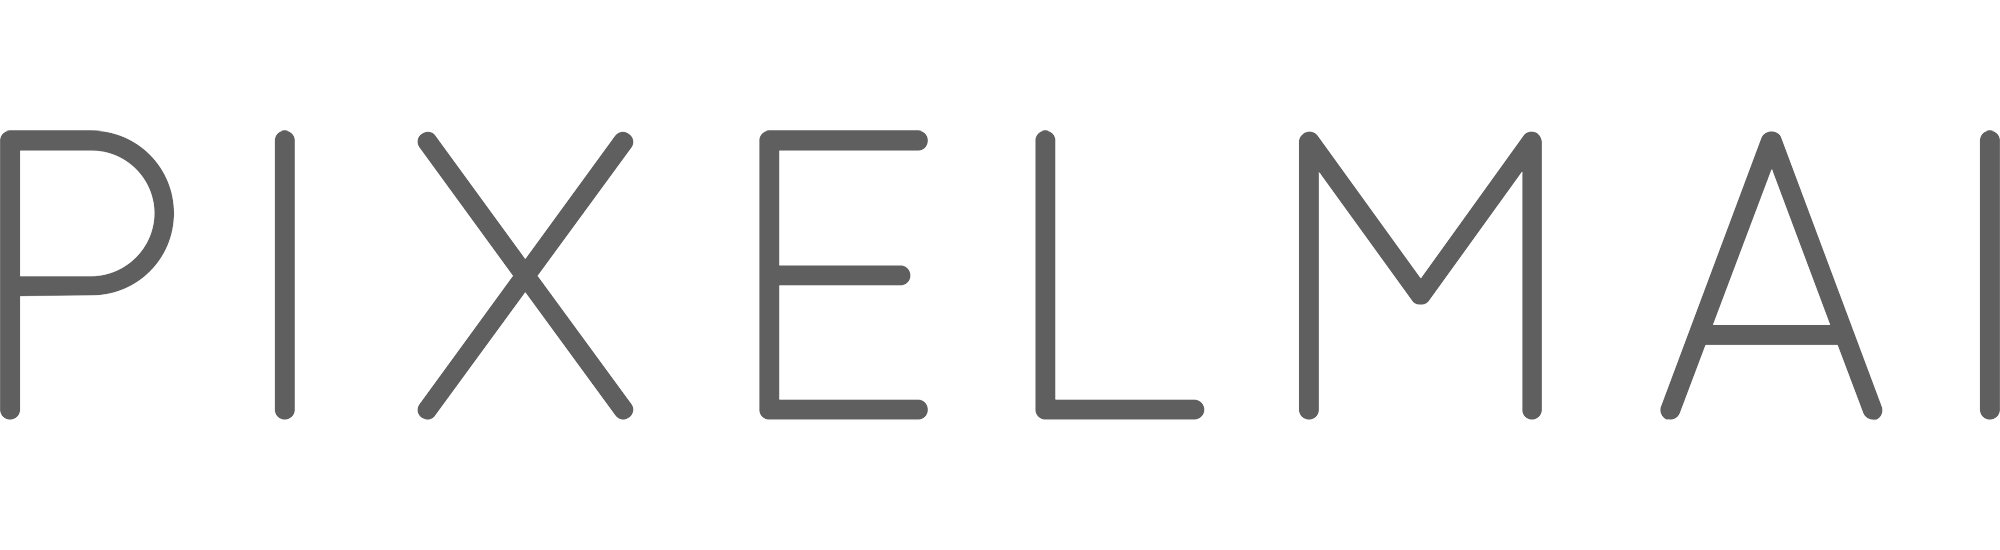 PixelMai